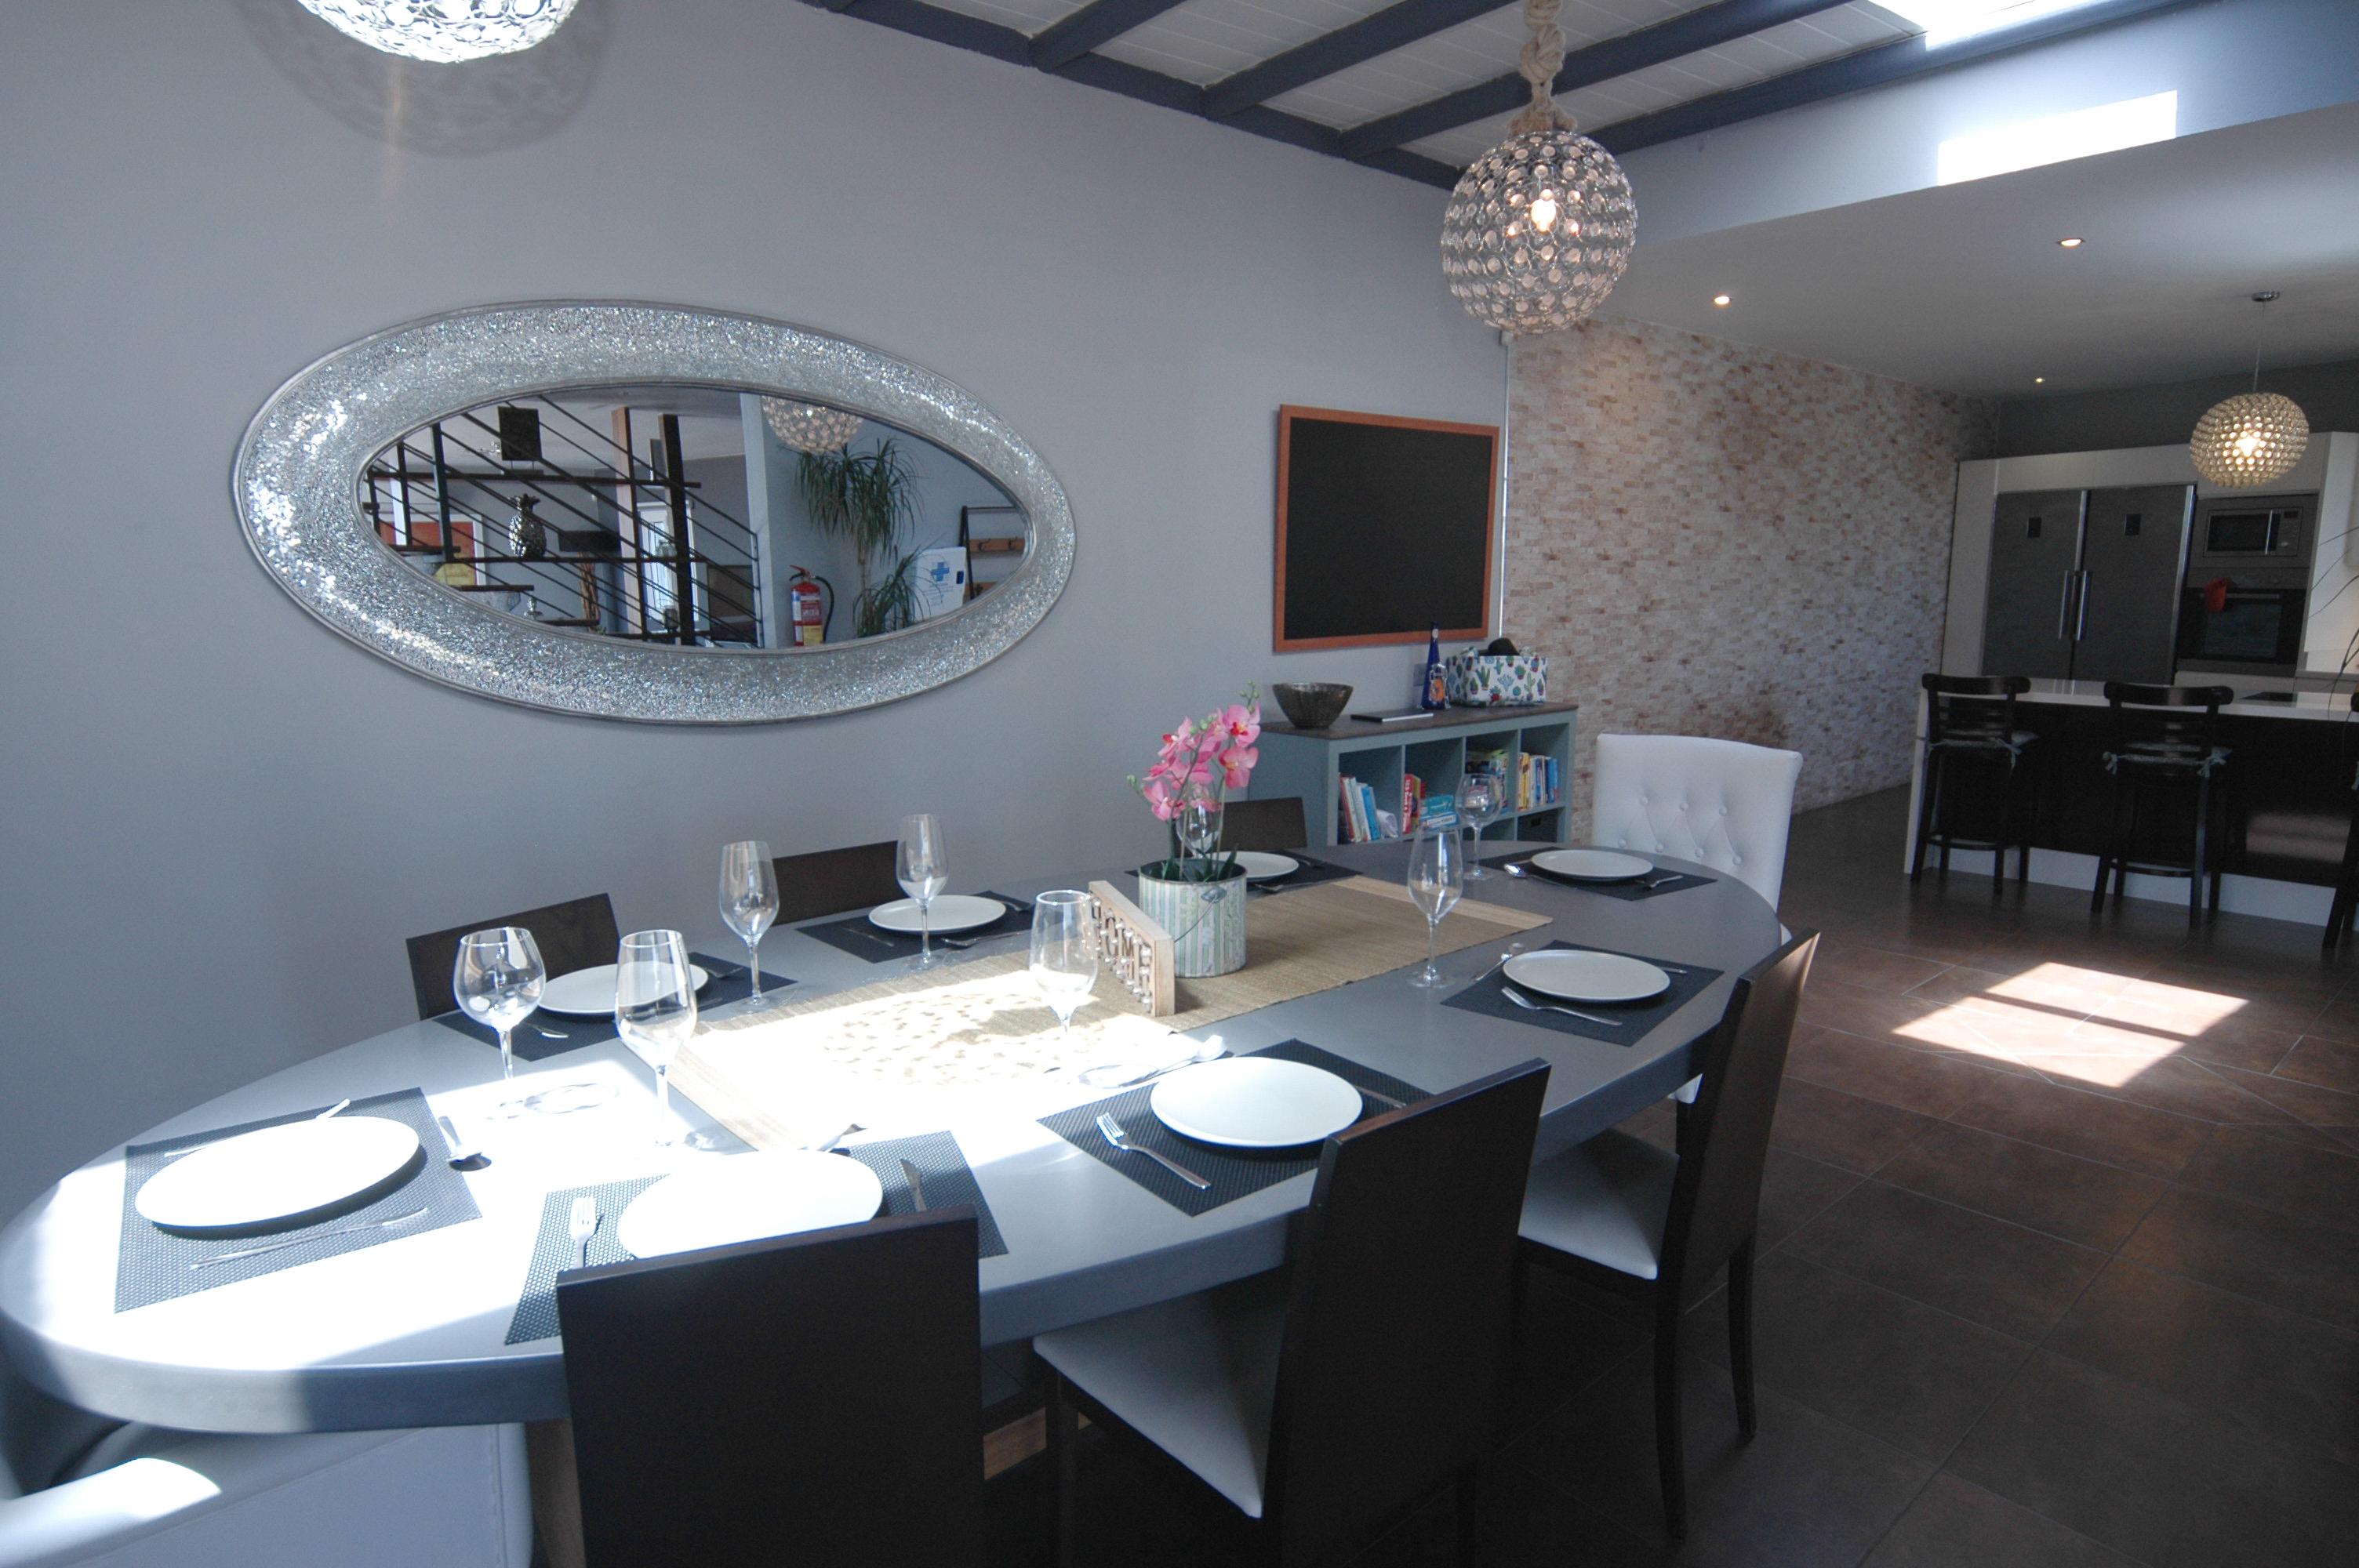 LVC318814 Dining area